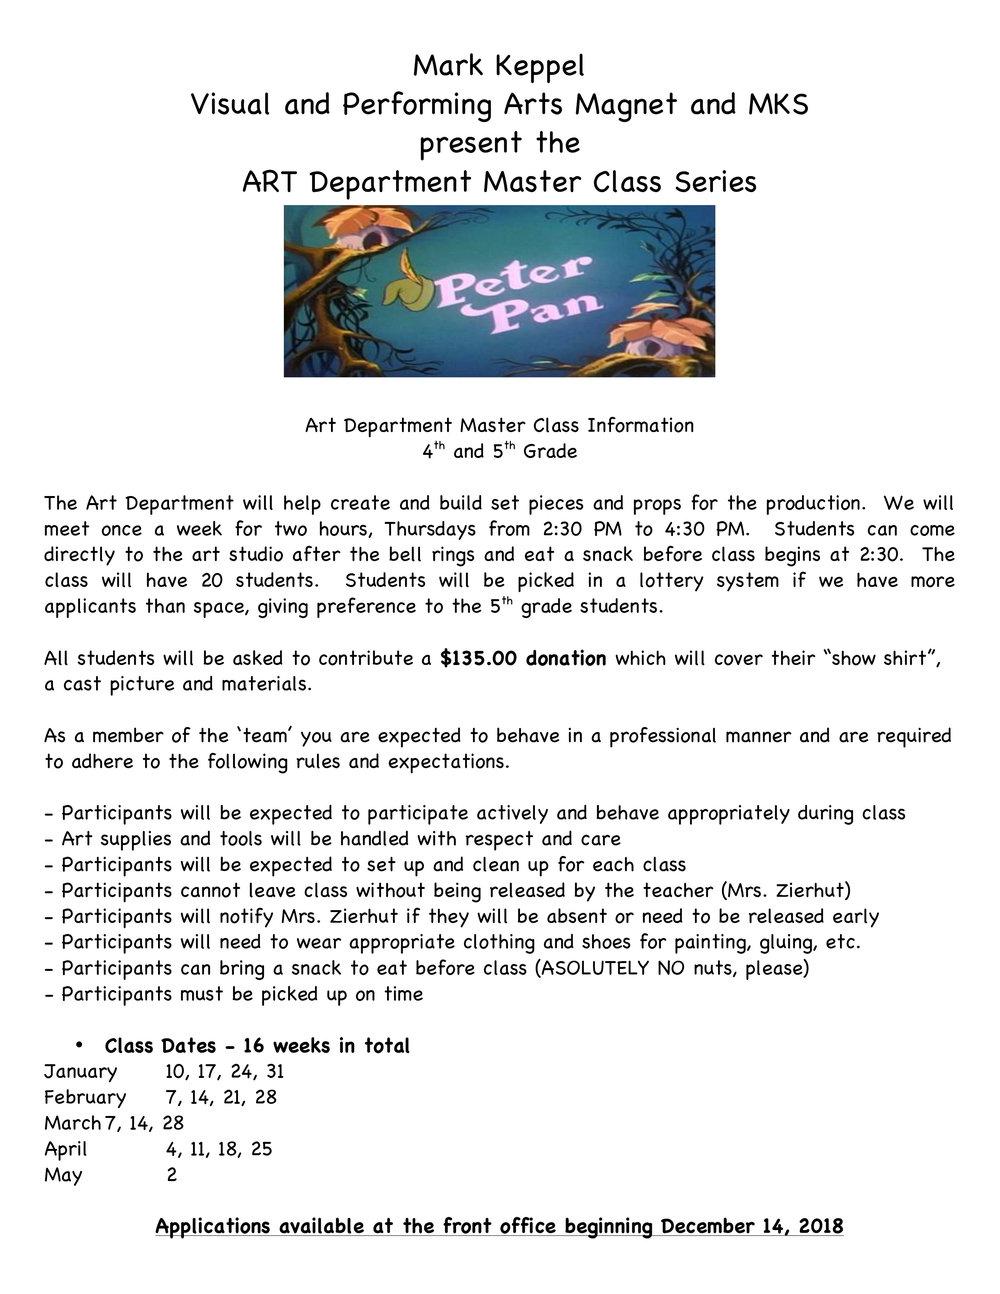 Peter Pan Art Department Announcement_1 page.jpg